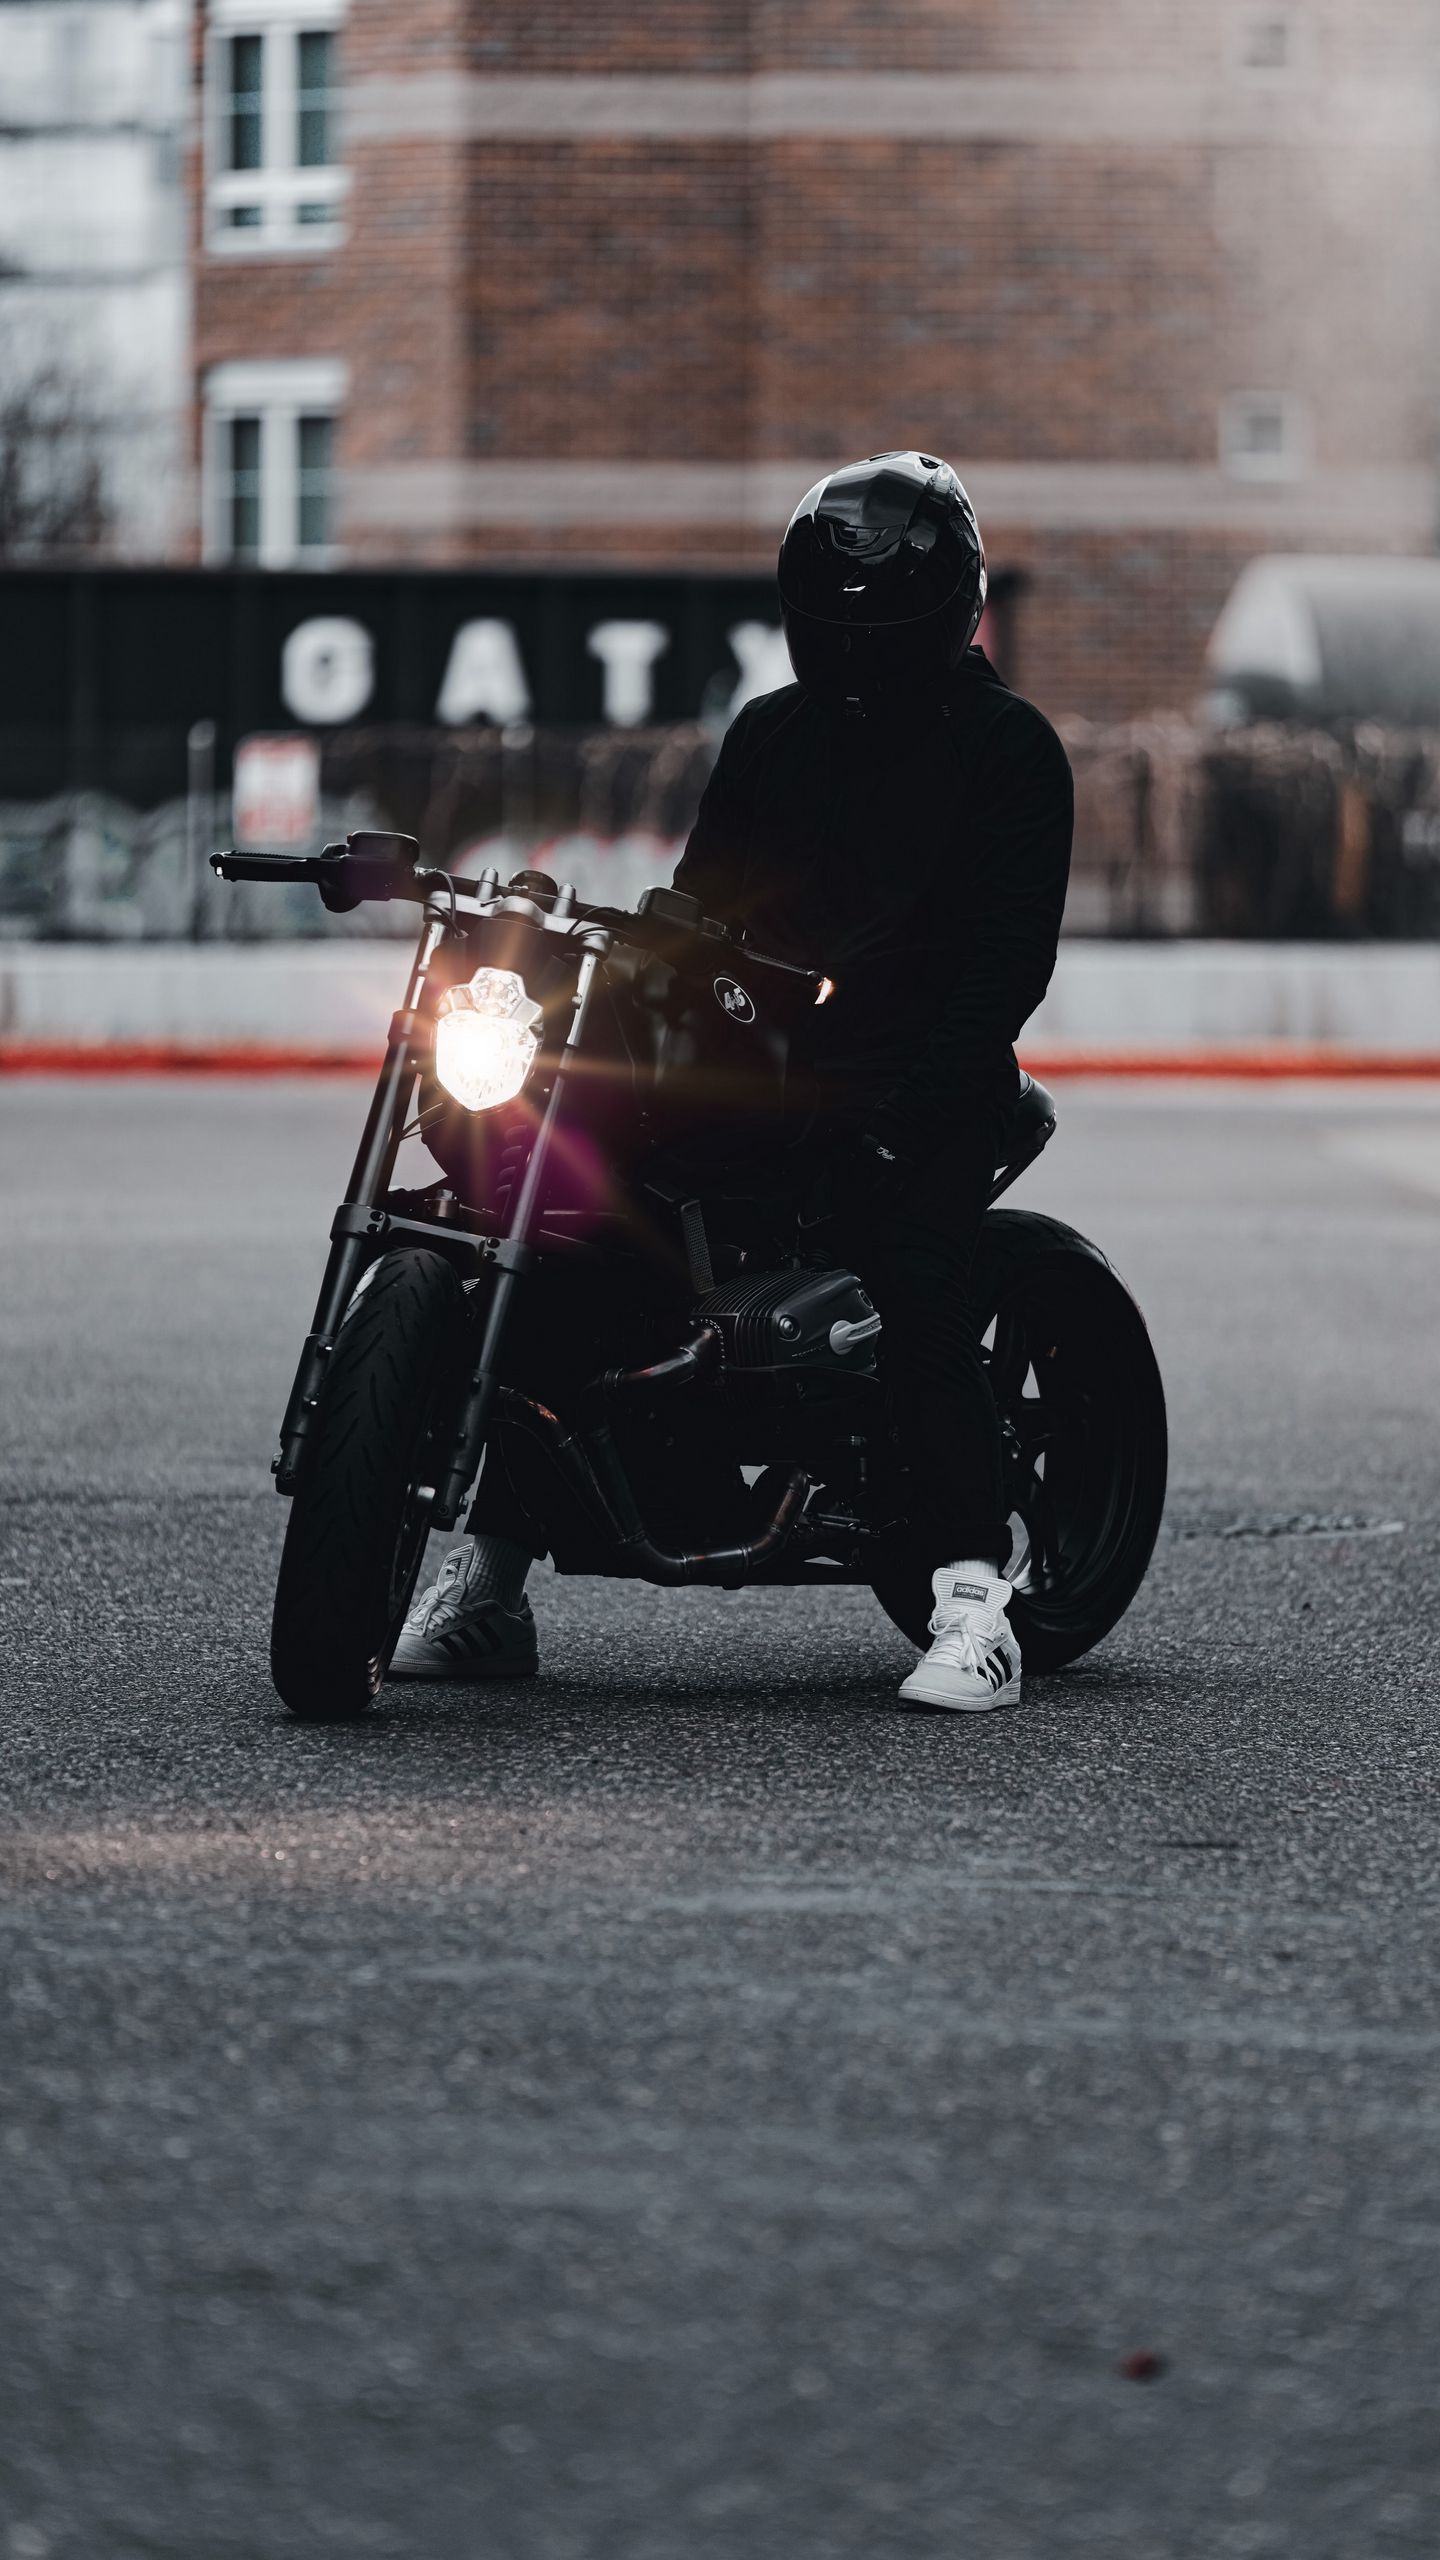 1440x2560 Обои мотоцикл, байк, мотоциклист, черный, свет, дорога